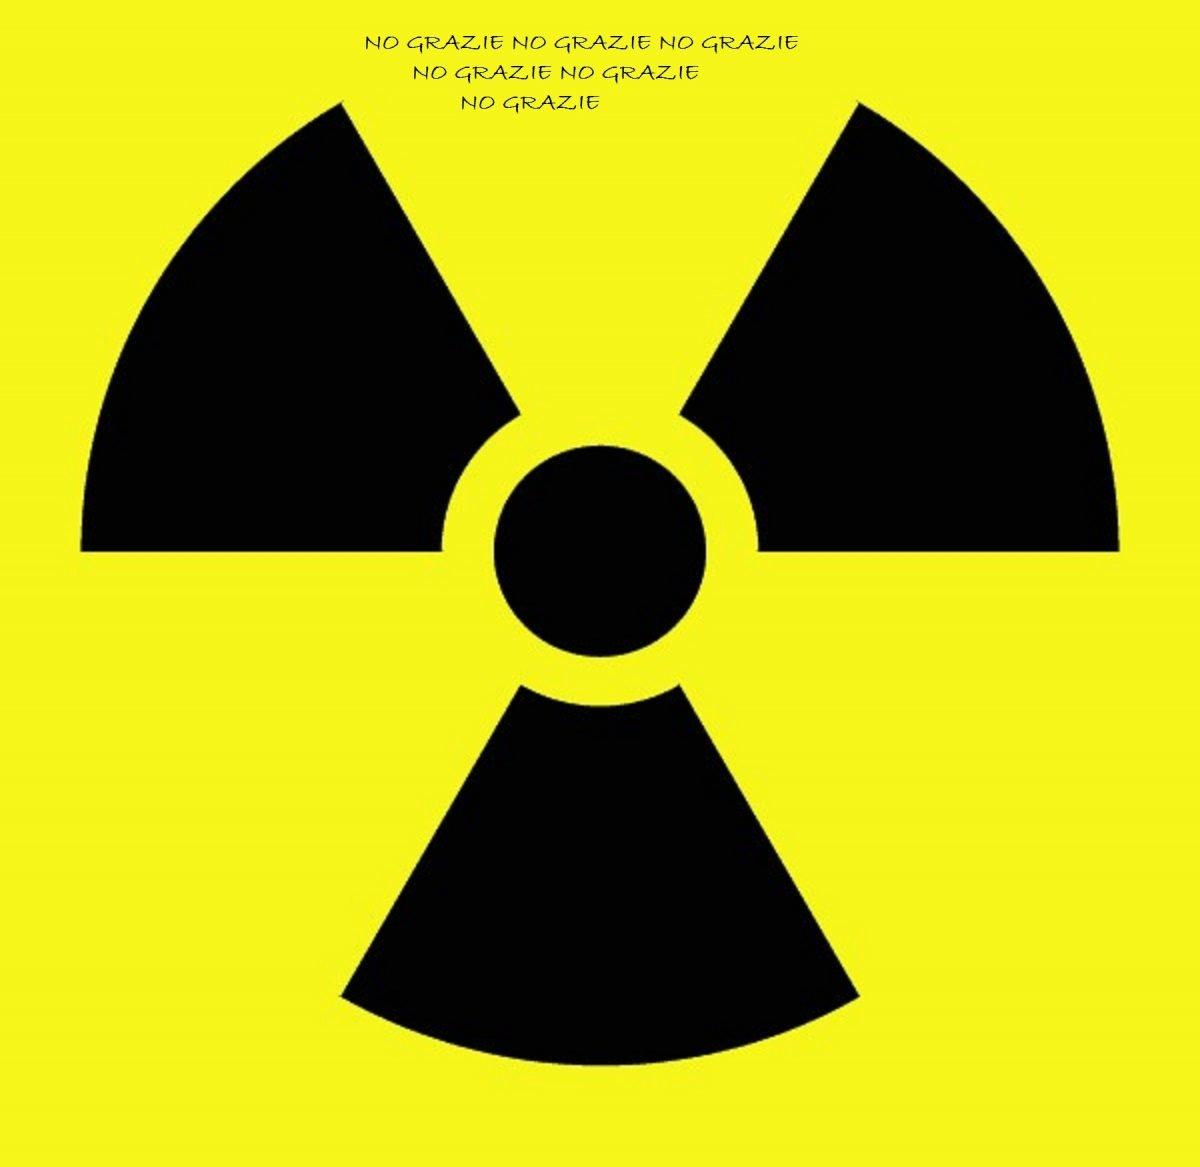 RADIOATTIVITà nucleare